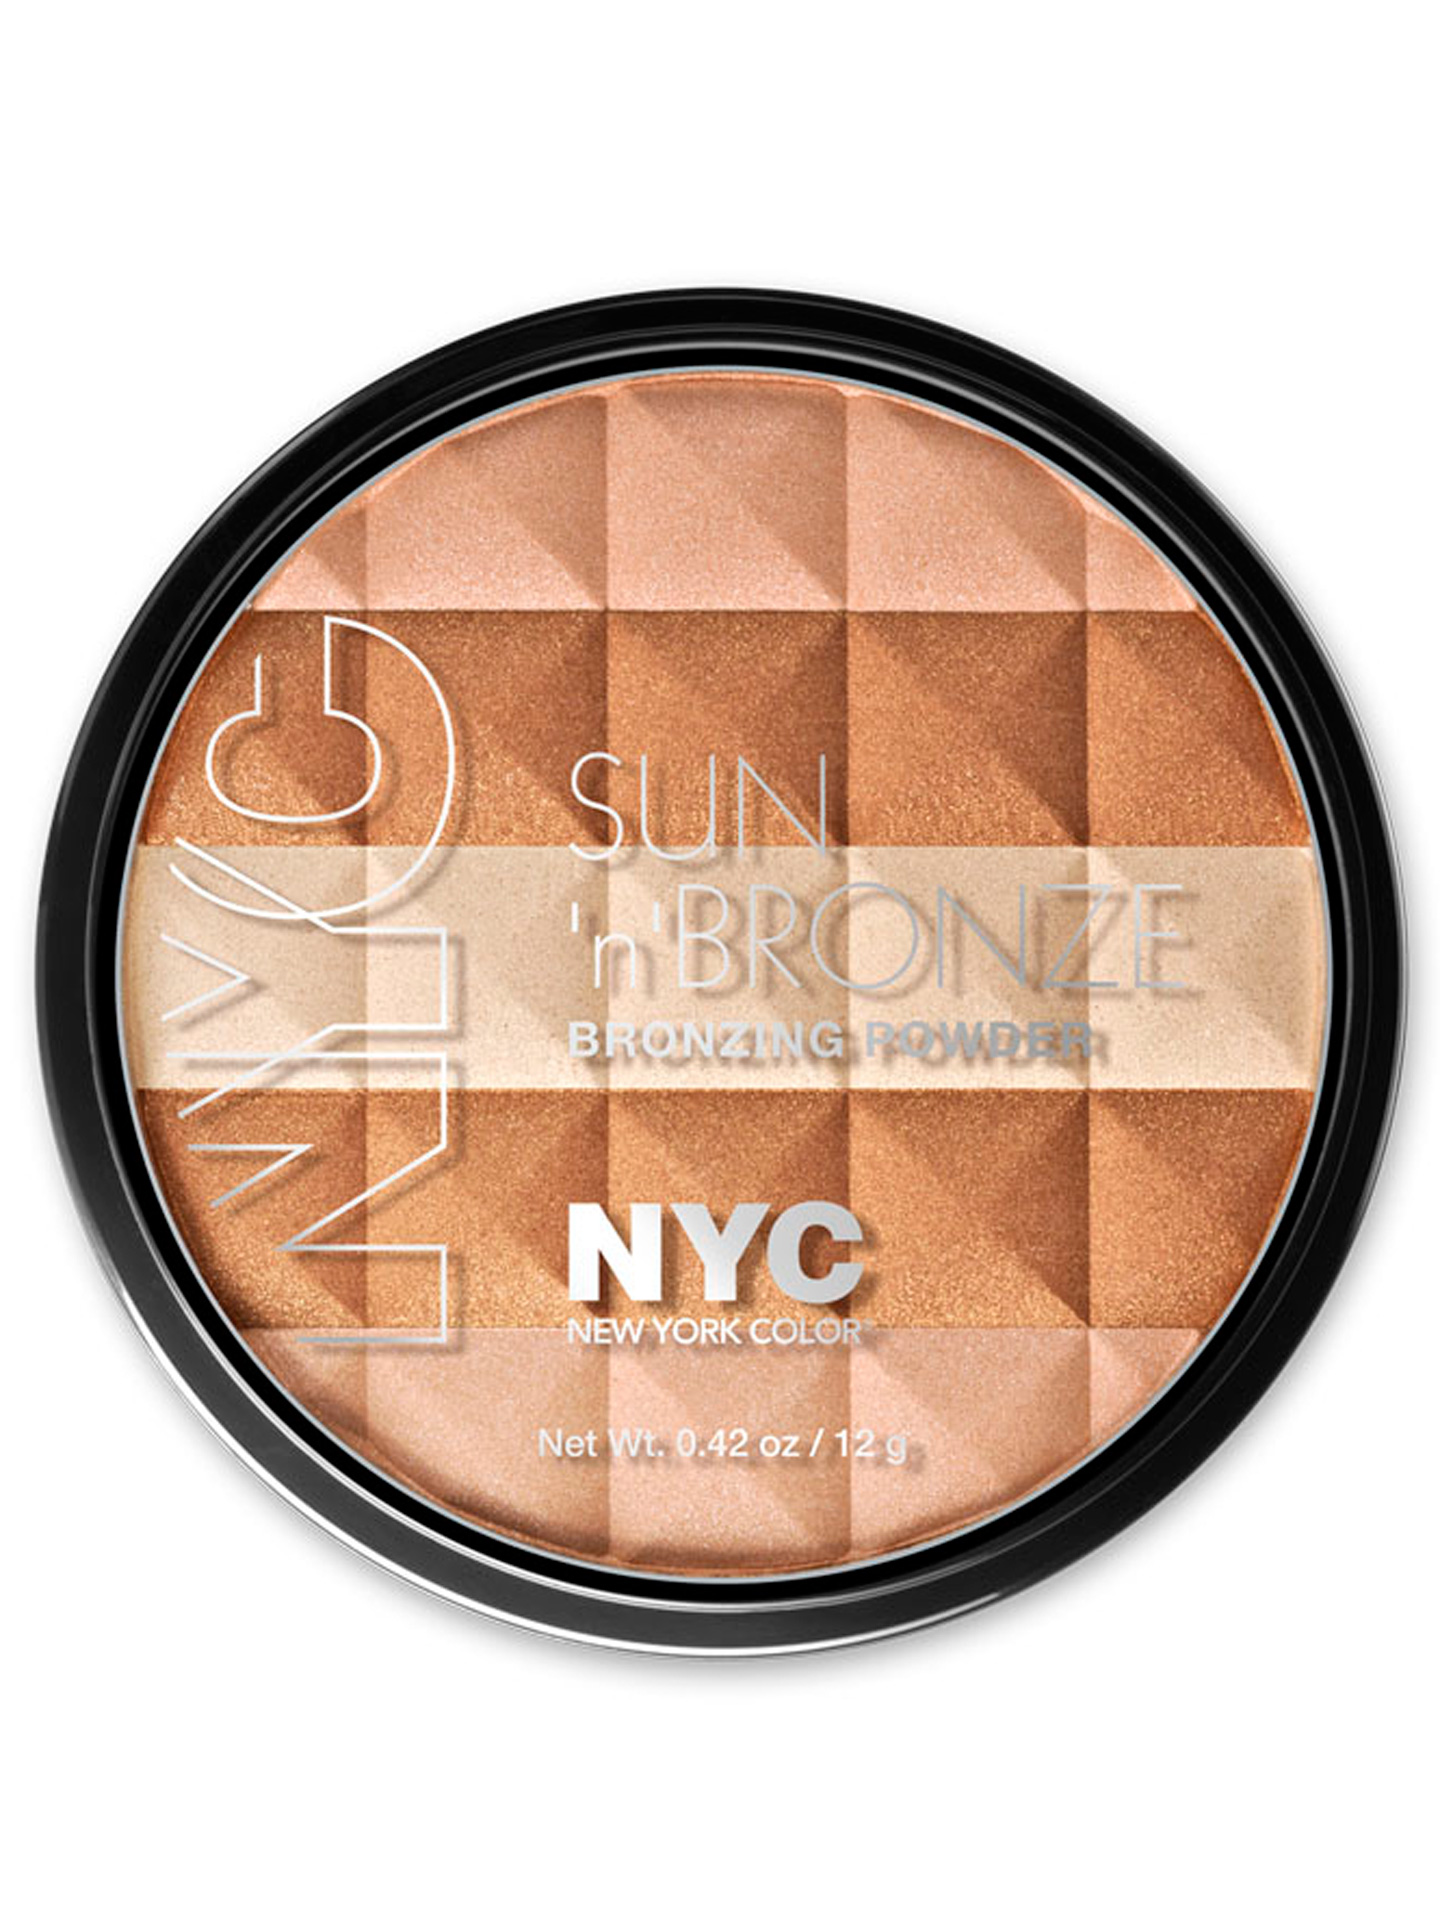 Best Bronzer And Blush: Best Bronzer For Every Skin Tone